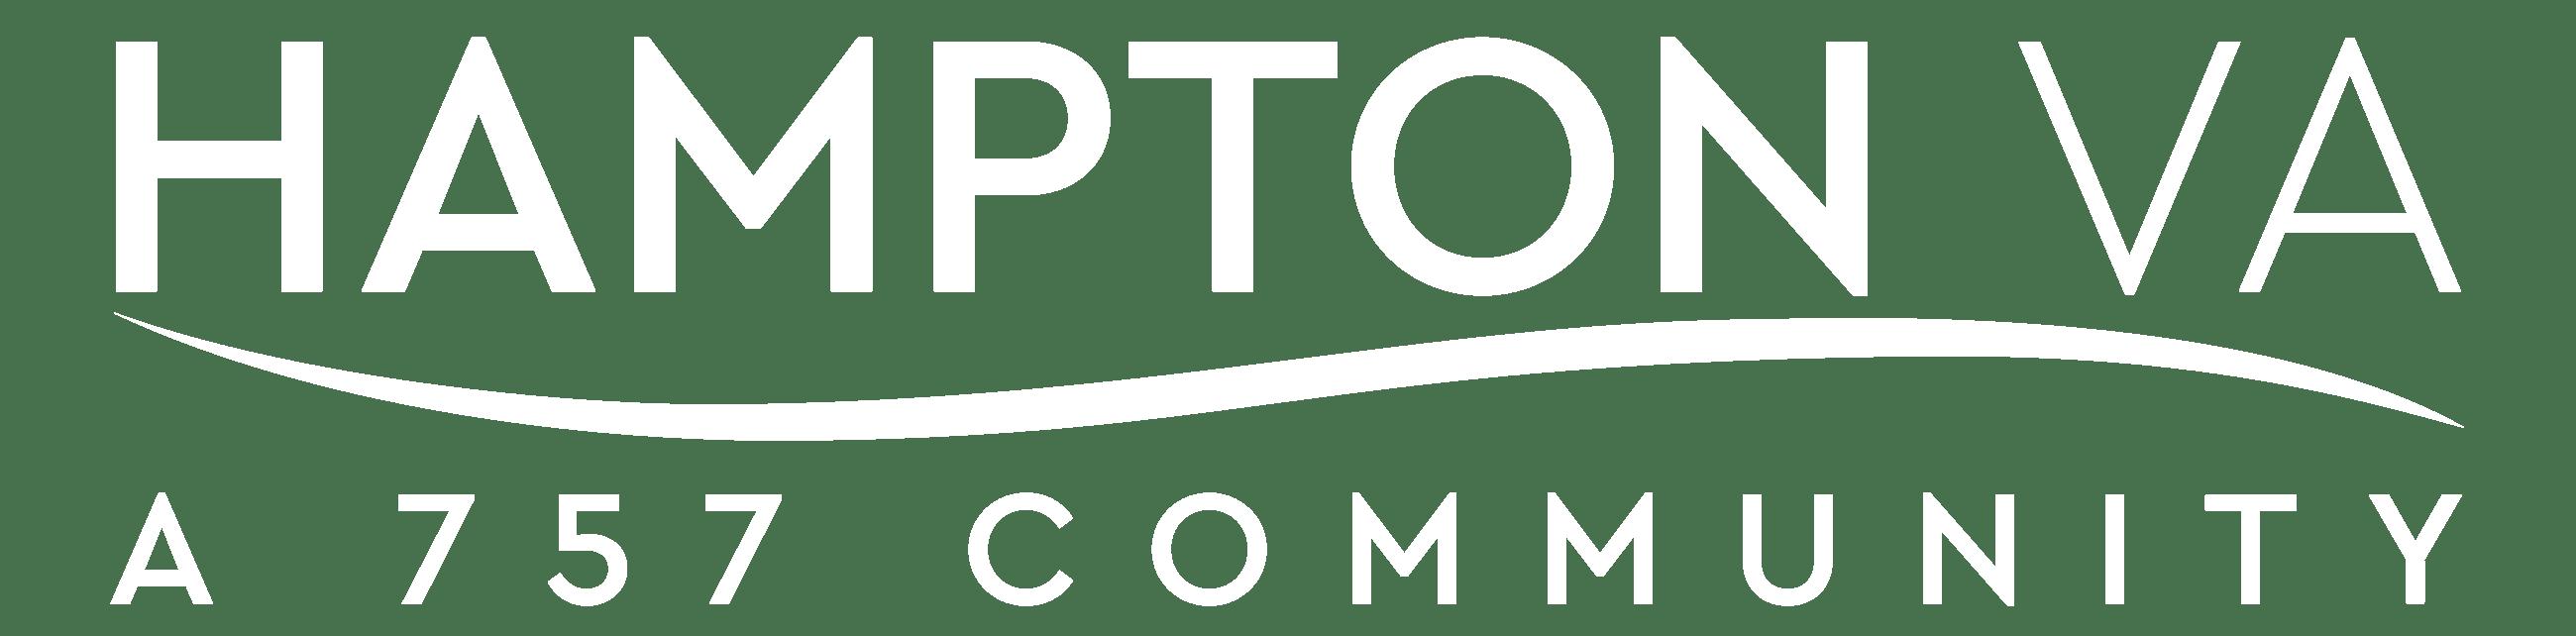 Hampton, VA - Official Website | Official Website